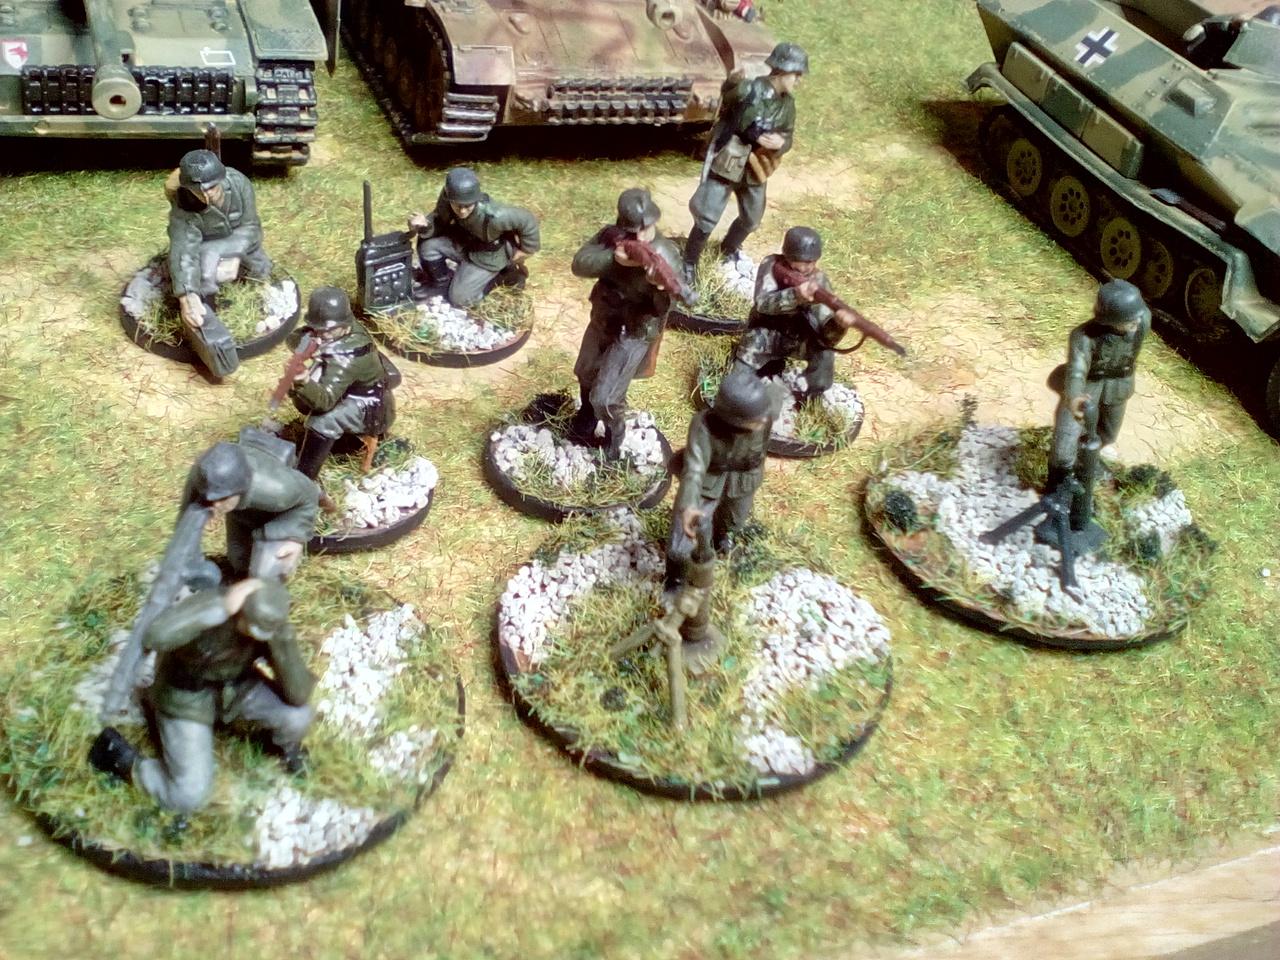 Armeeaufbau in gaaaaaaanz langsam.... - Seite 2 Img_20200114_191331objr4